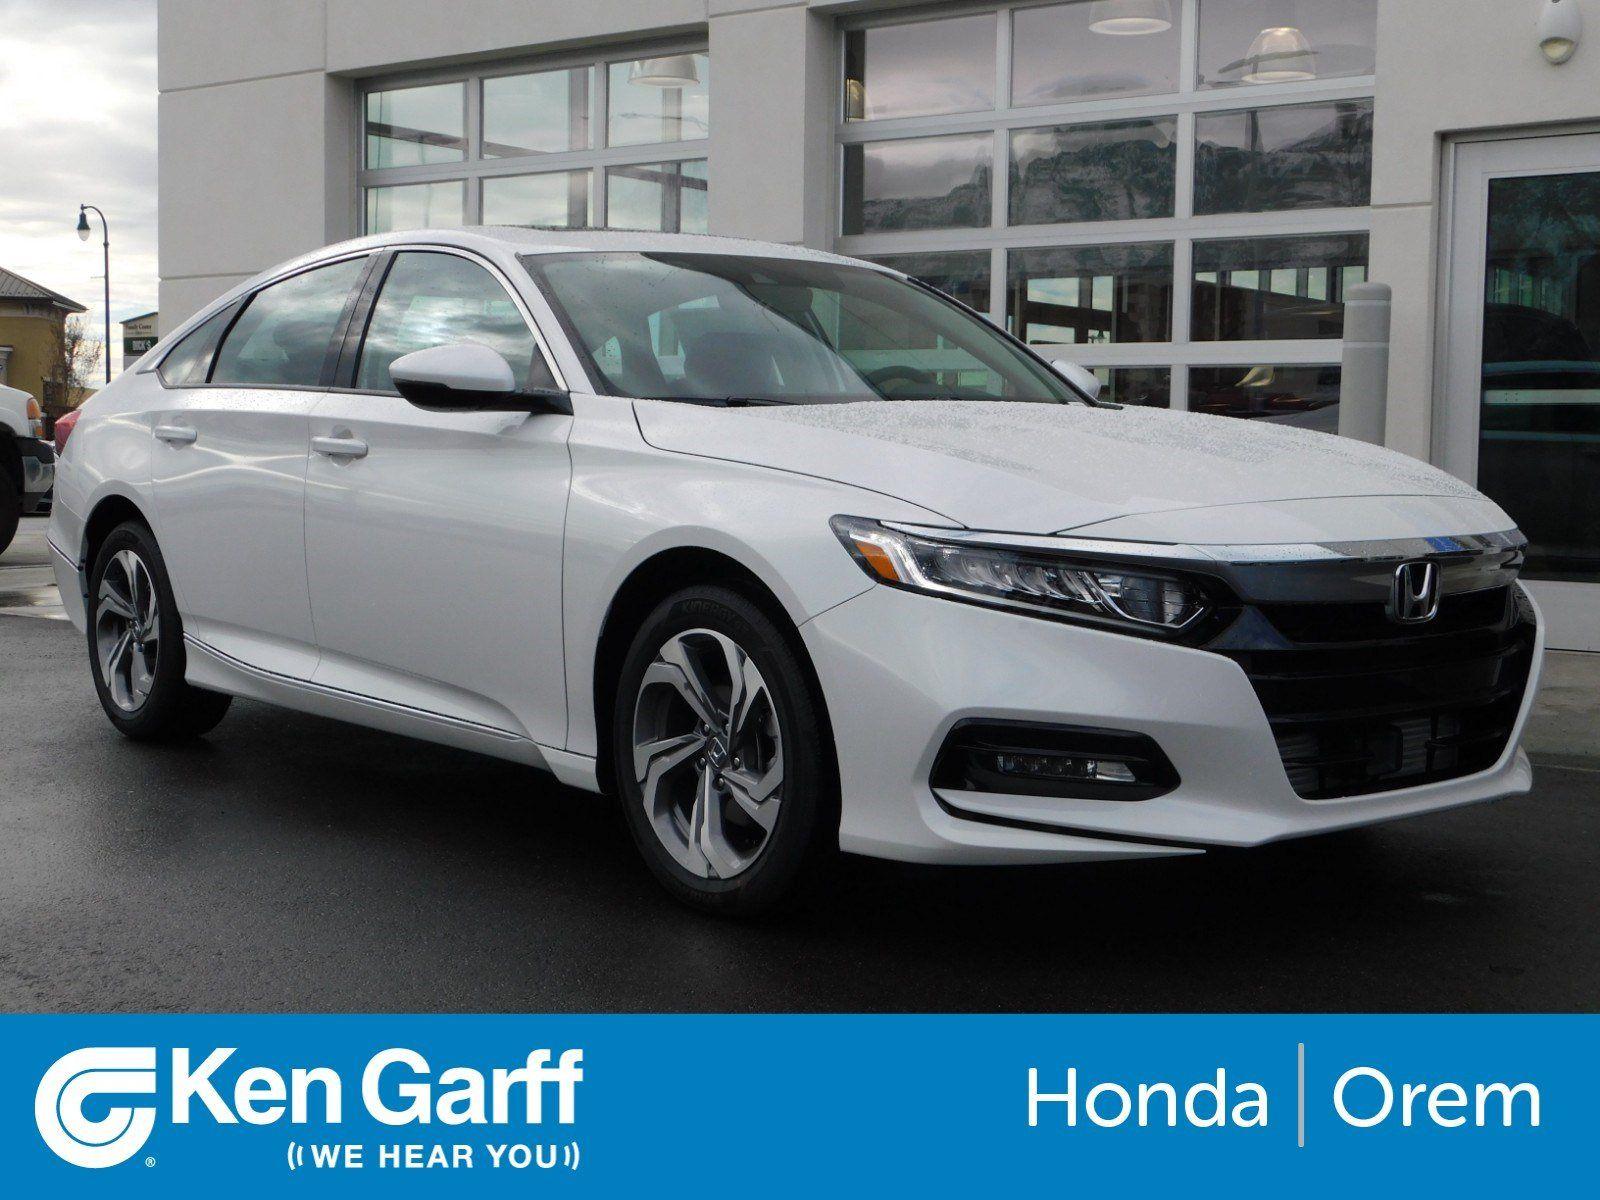 Honda Accord 2019 Sedan Honda accord, Sedan, Sedan sport